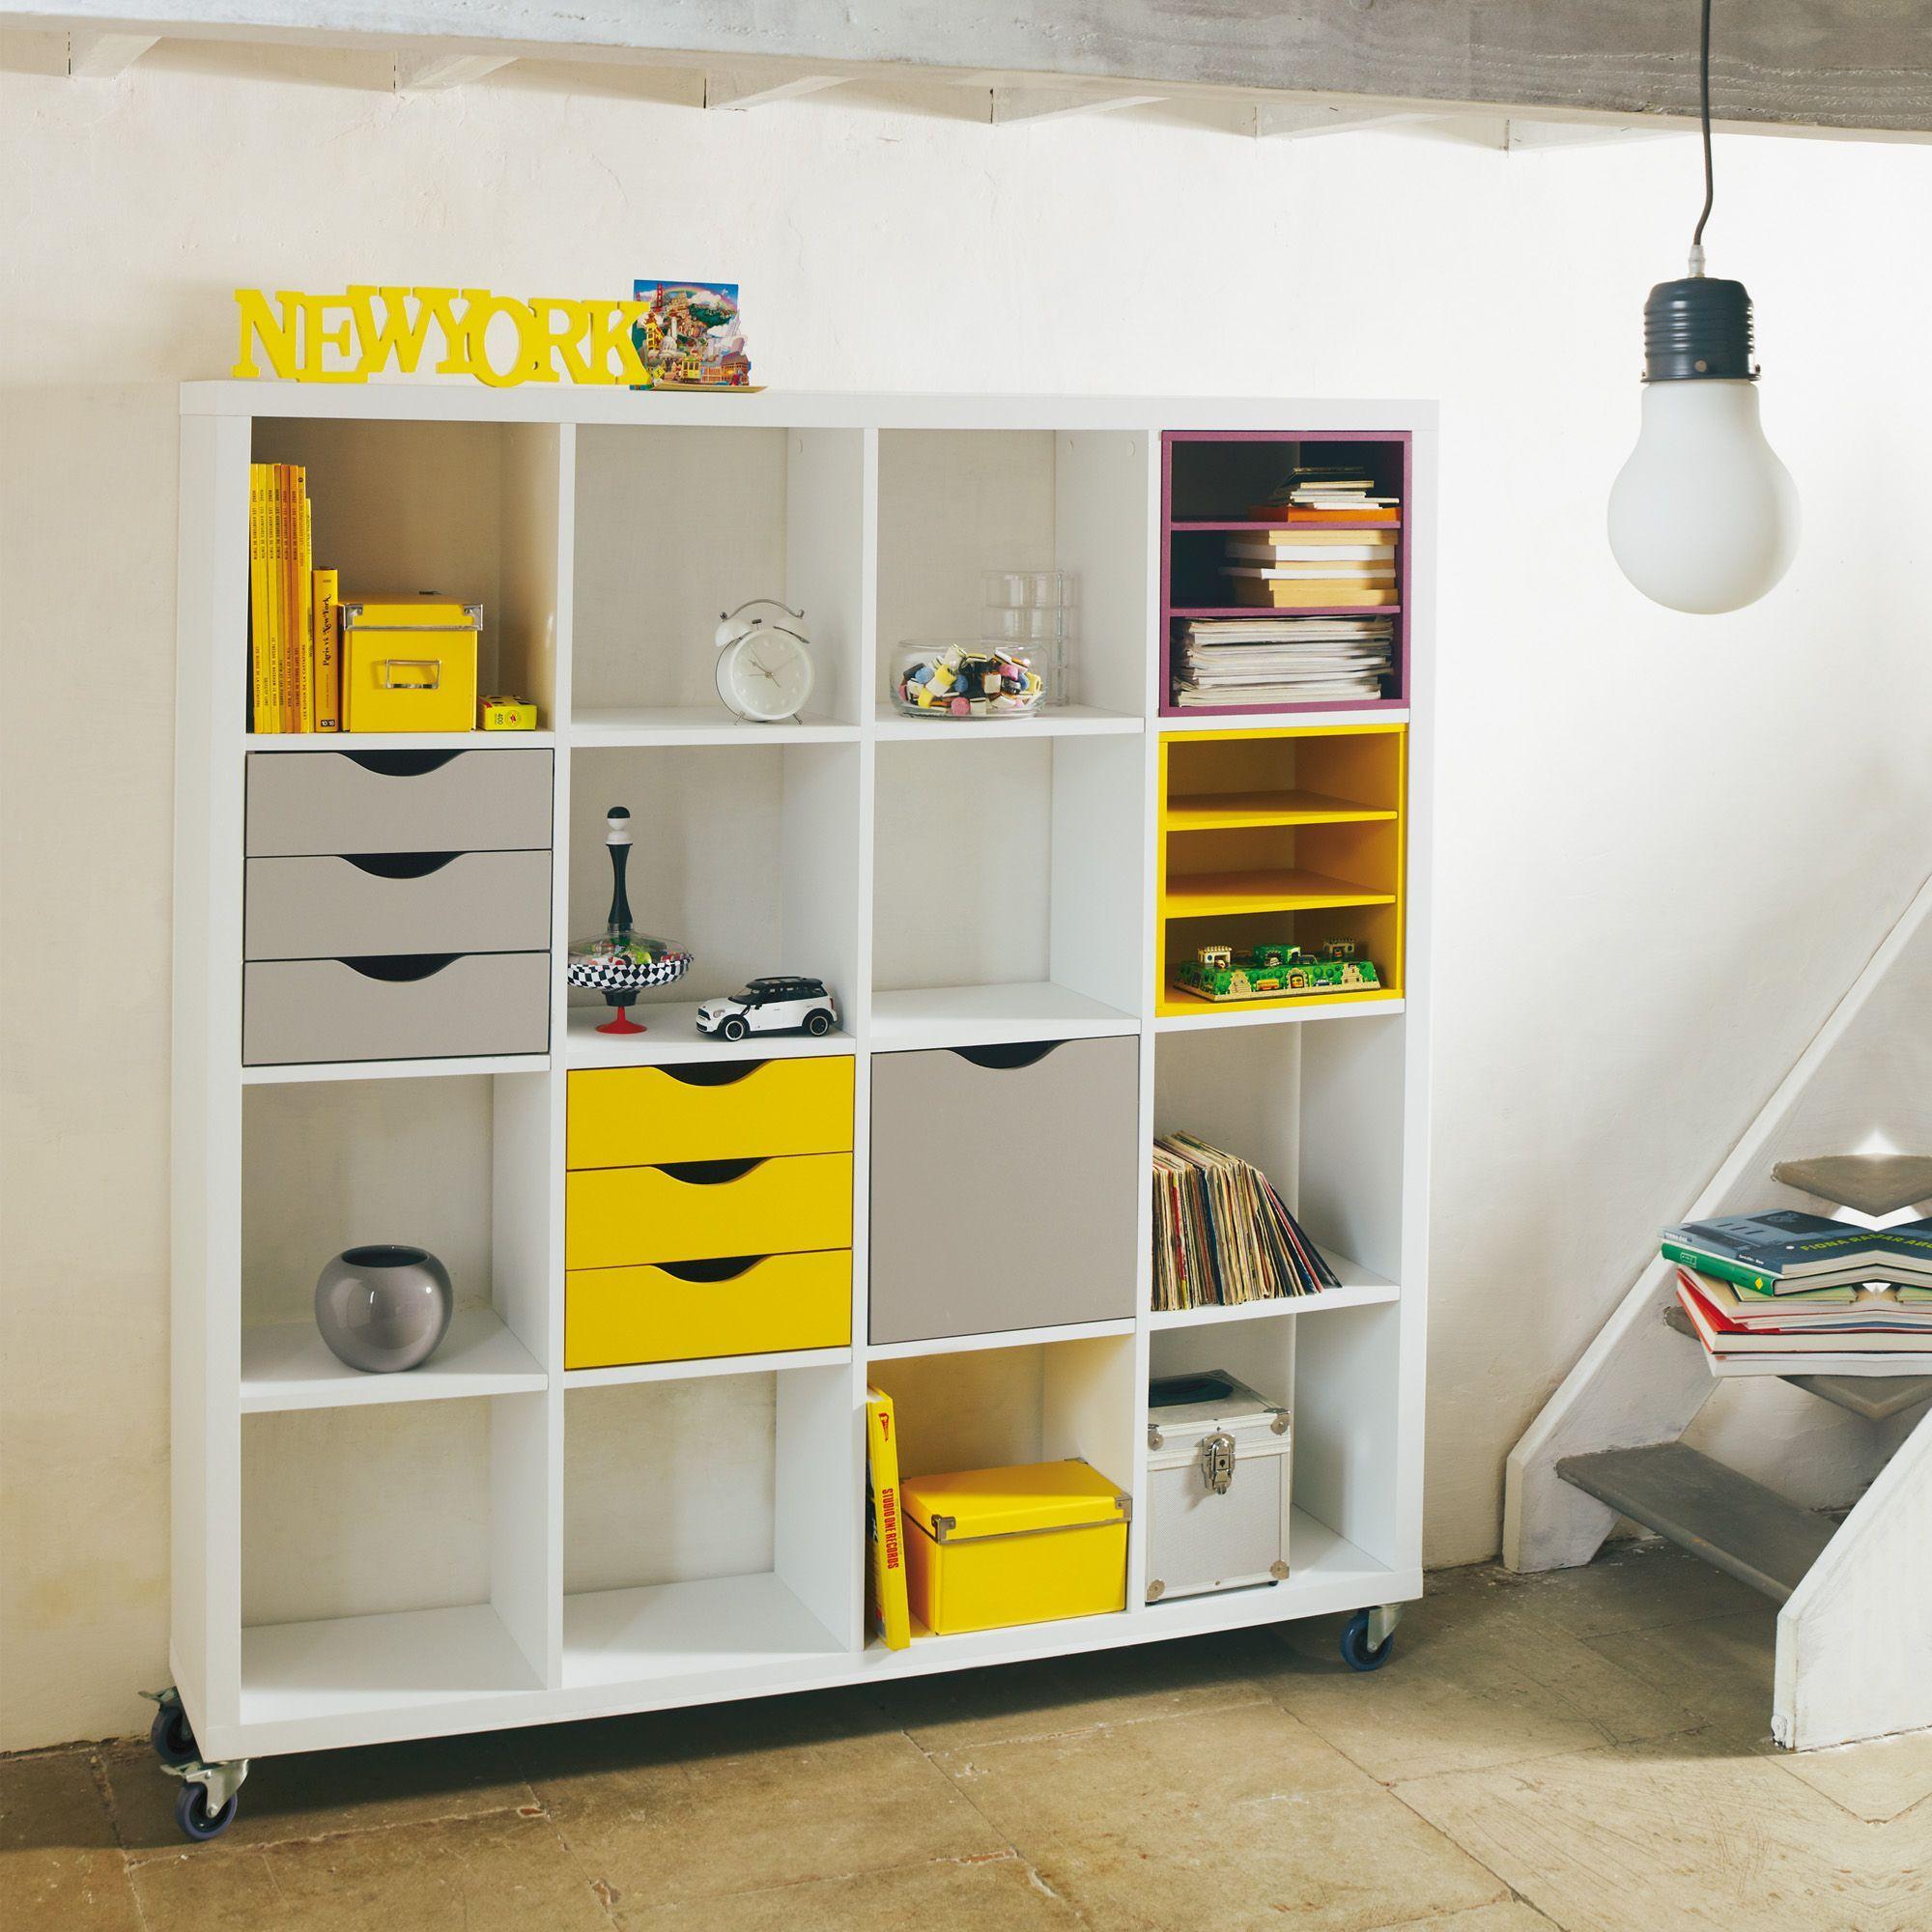 lot de 2 tag res blanches kubico tag res composer etag res livings composer tout pour. Black Bedroom Furniture Sets. Home Design Ideas